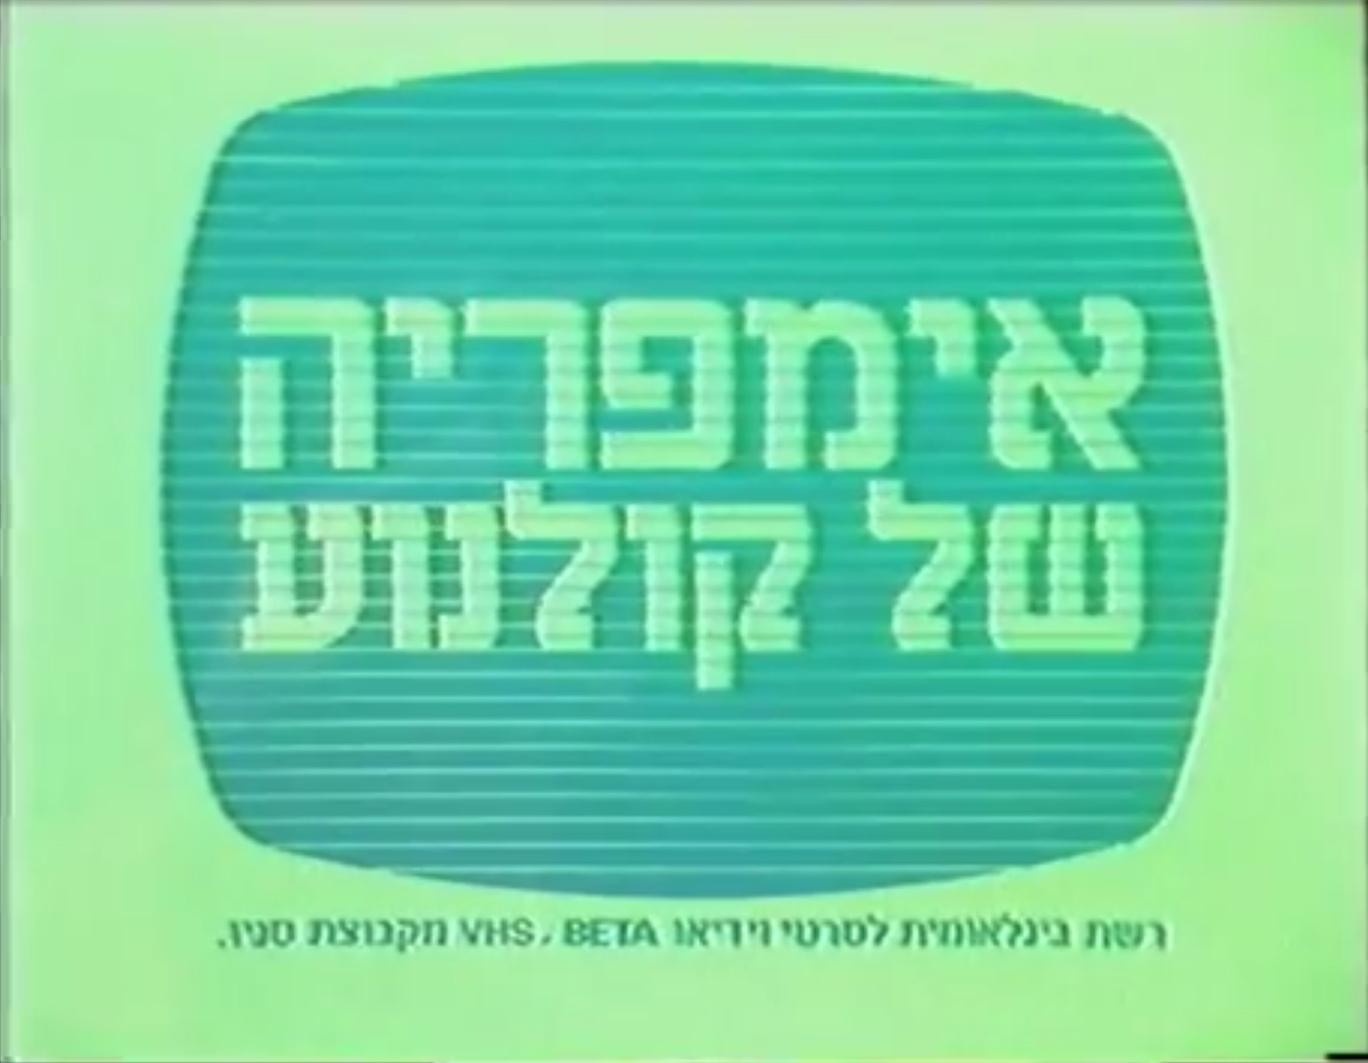 Empire of Cinema (Israel)